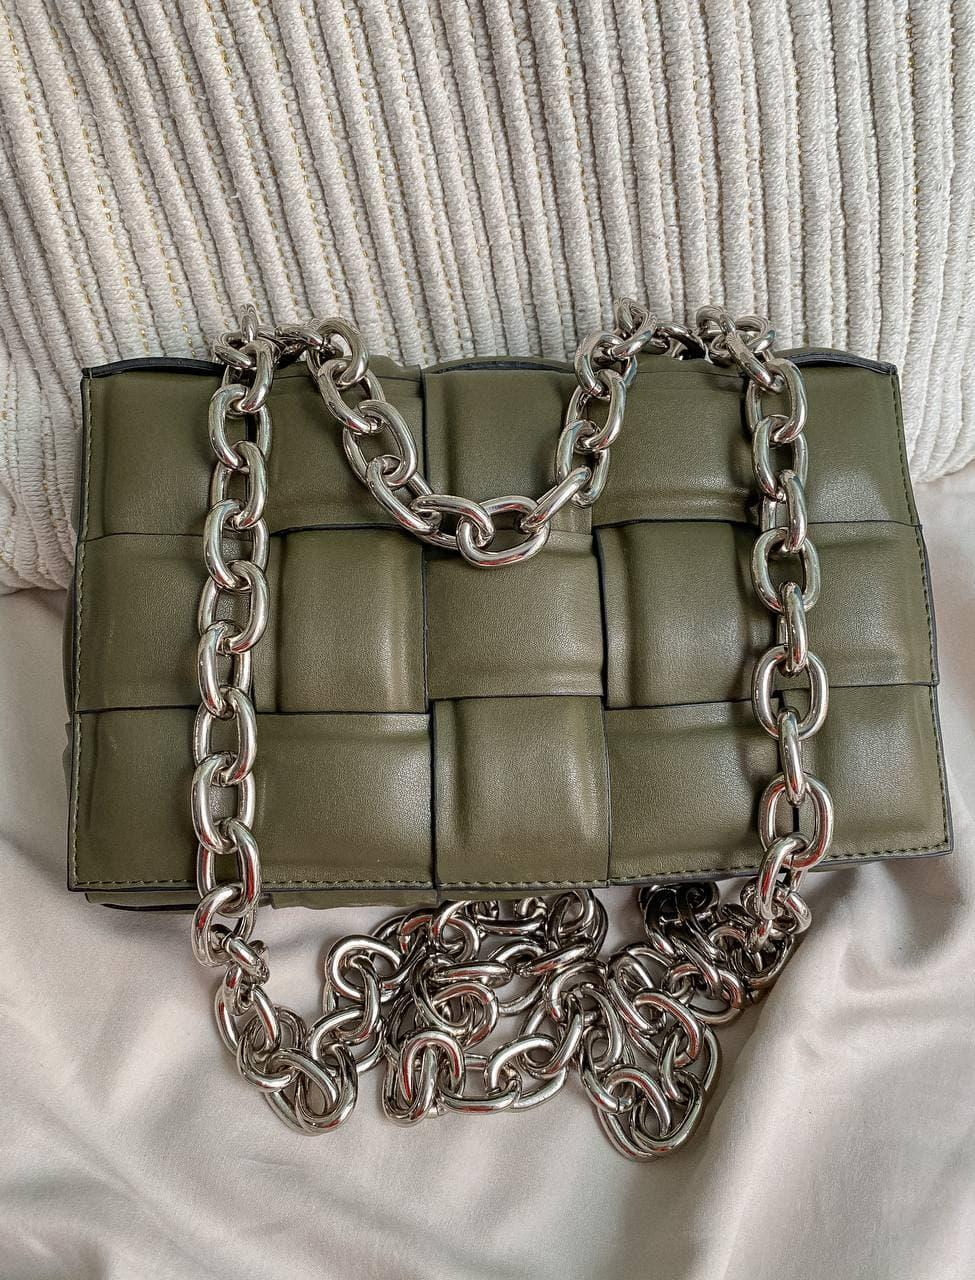 Жіноча сумка Bottega Veneta The Chain Cassette Khaki | Плетений клатч Боттега Венета Хакі